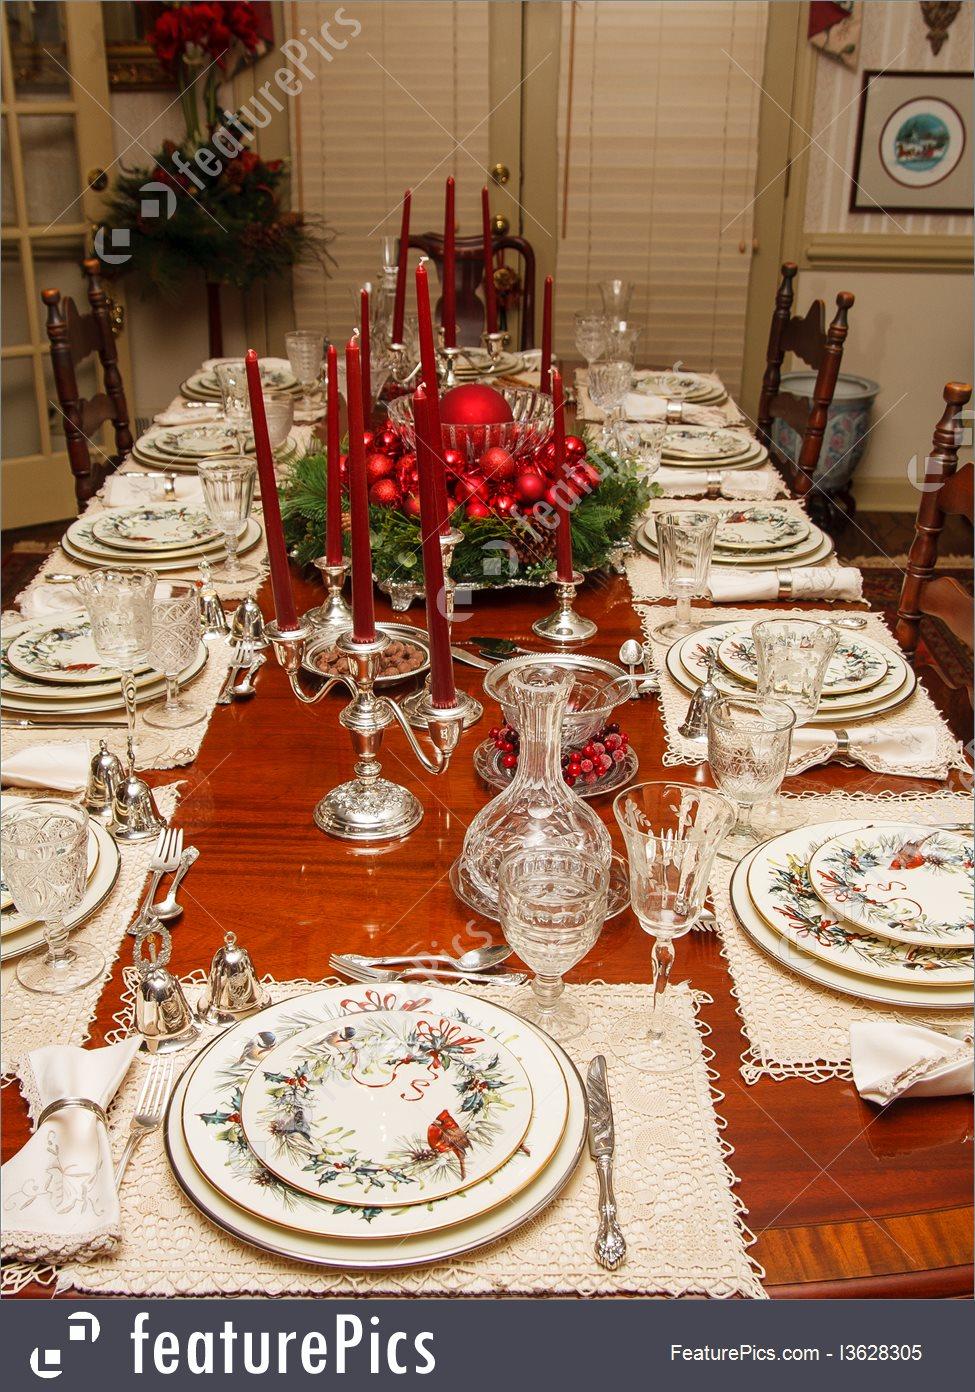 27+ Formal dining room christmas decorating ideas ideas